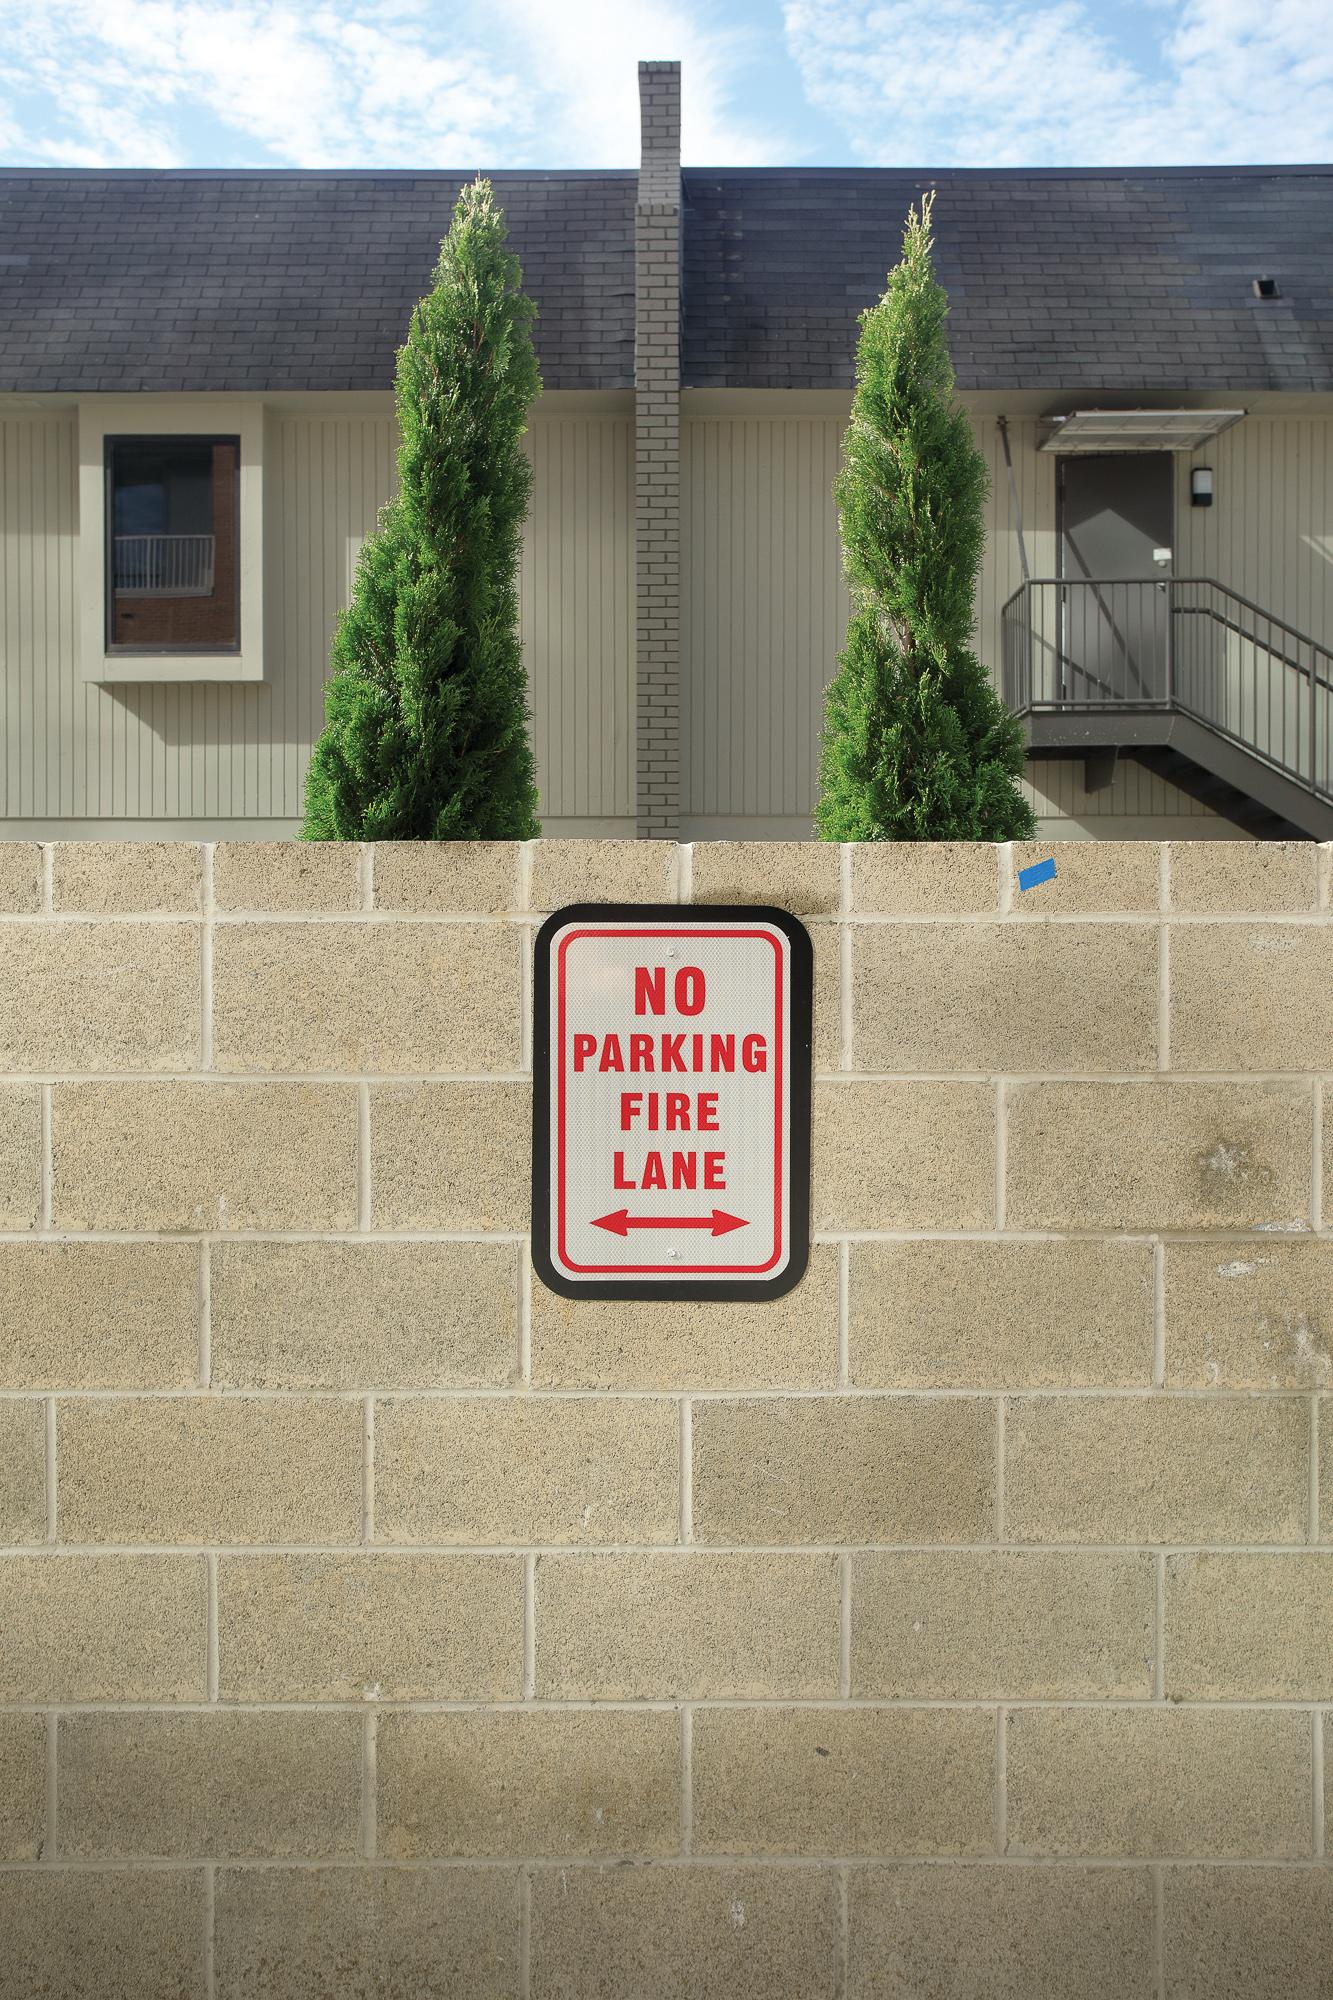 Vertis-Green-Hills_wayfinding-signage_no parking-fire-lane_MG_5227_small 2000 px.jpg